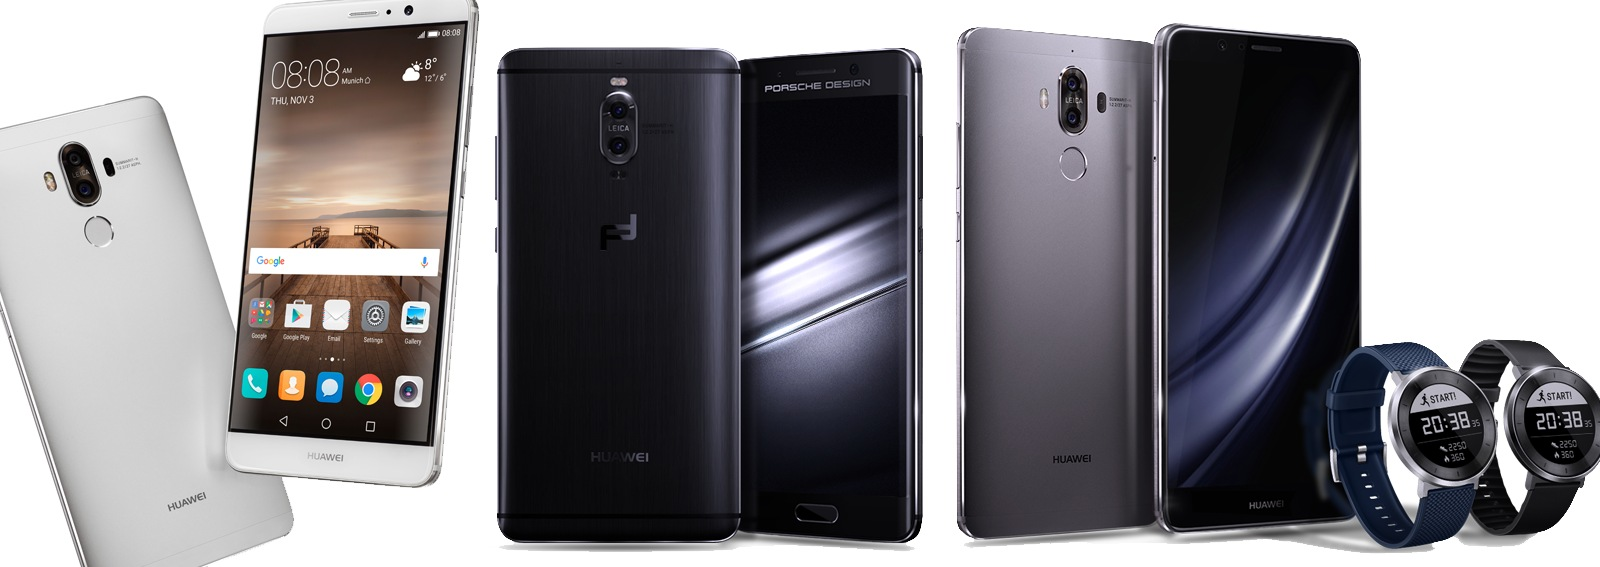 Huawei Mate 9 - Desktop